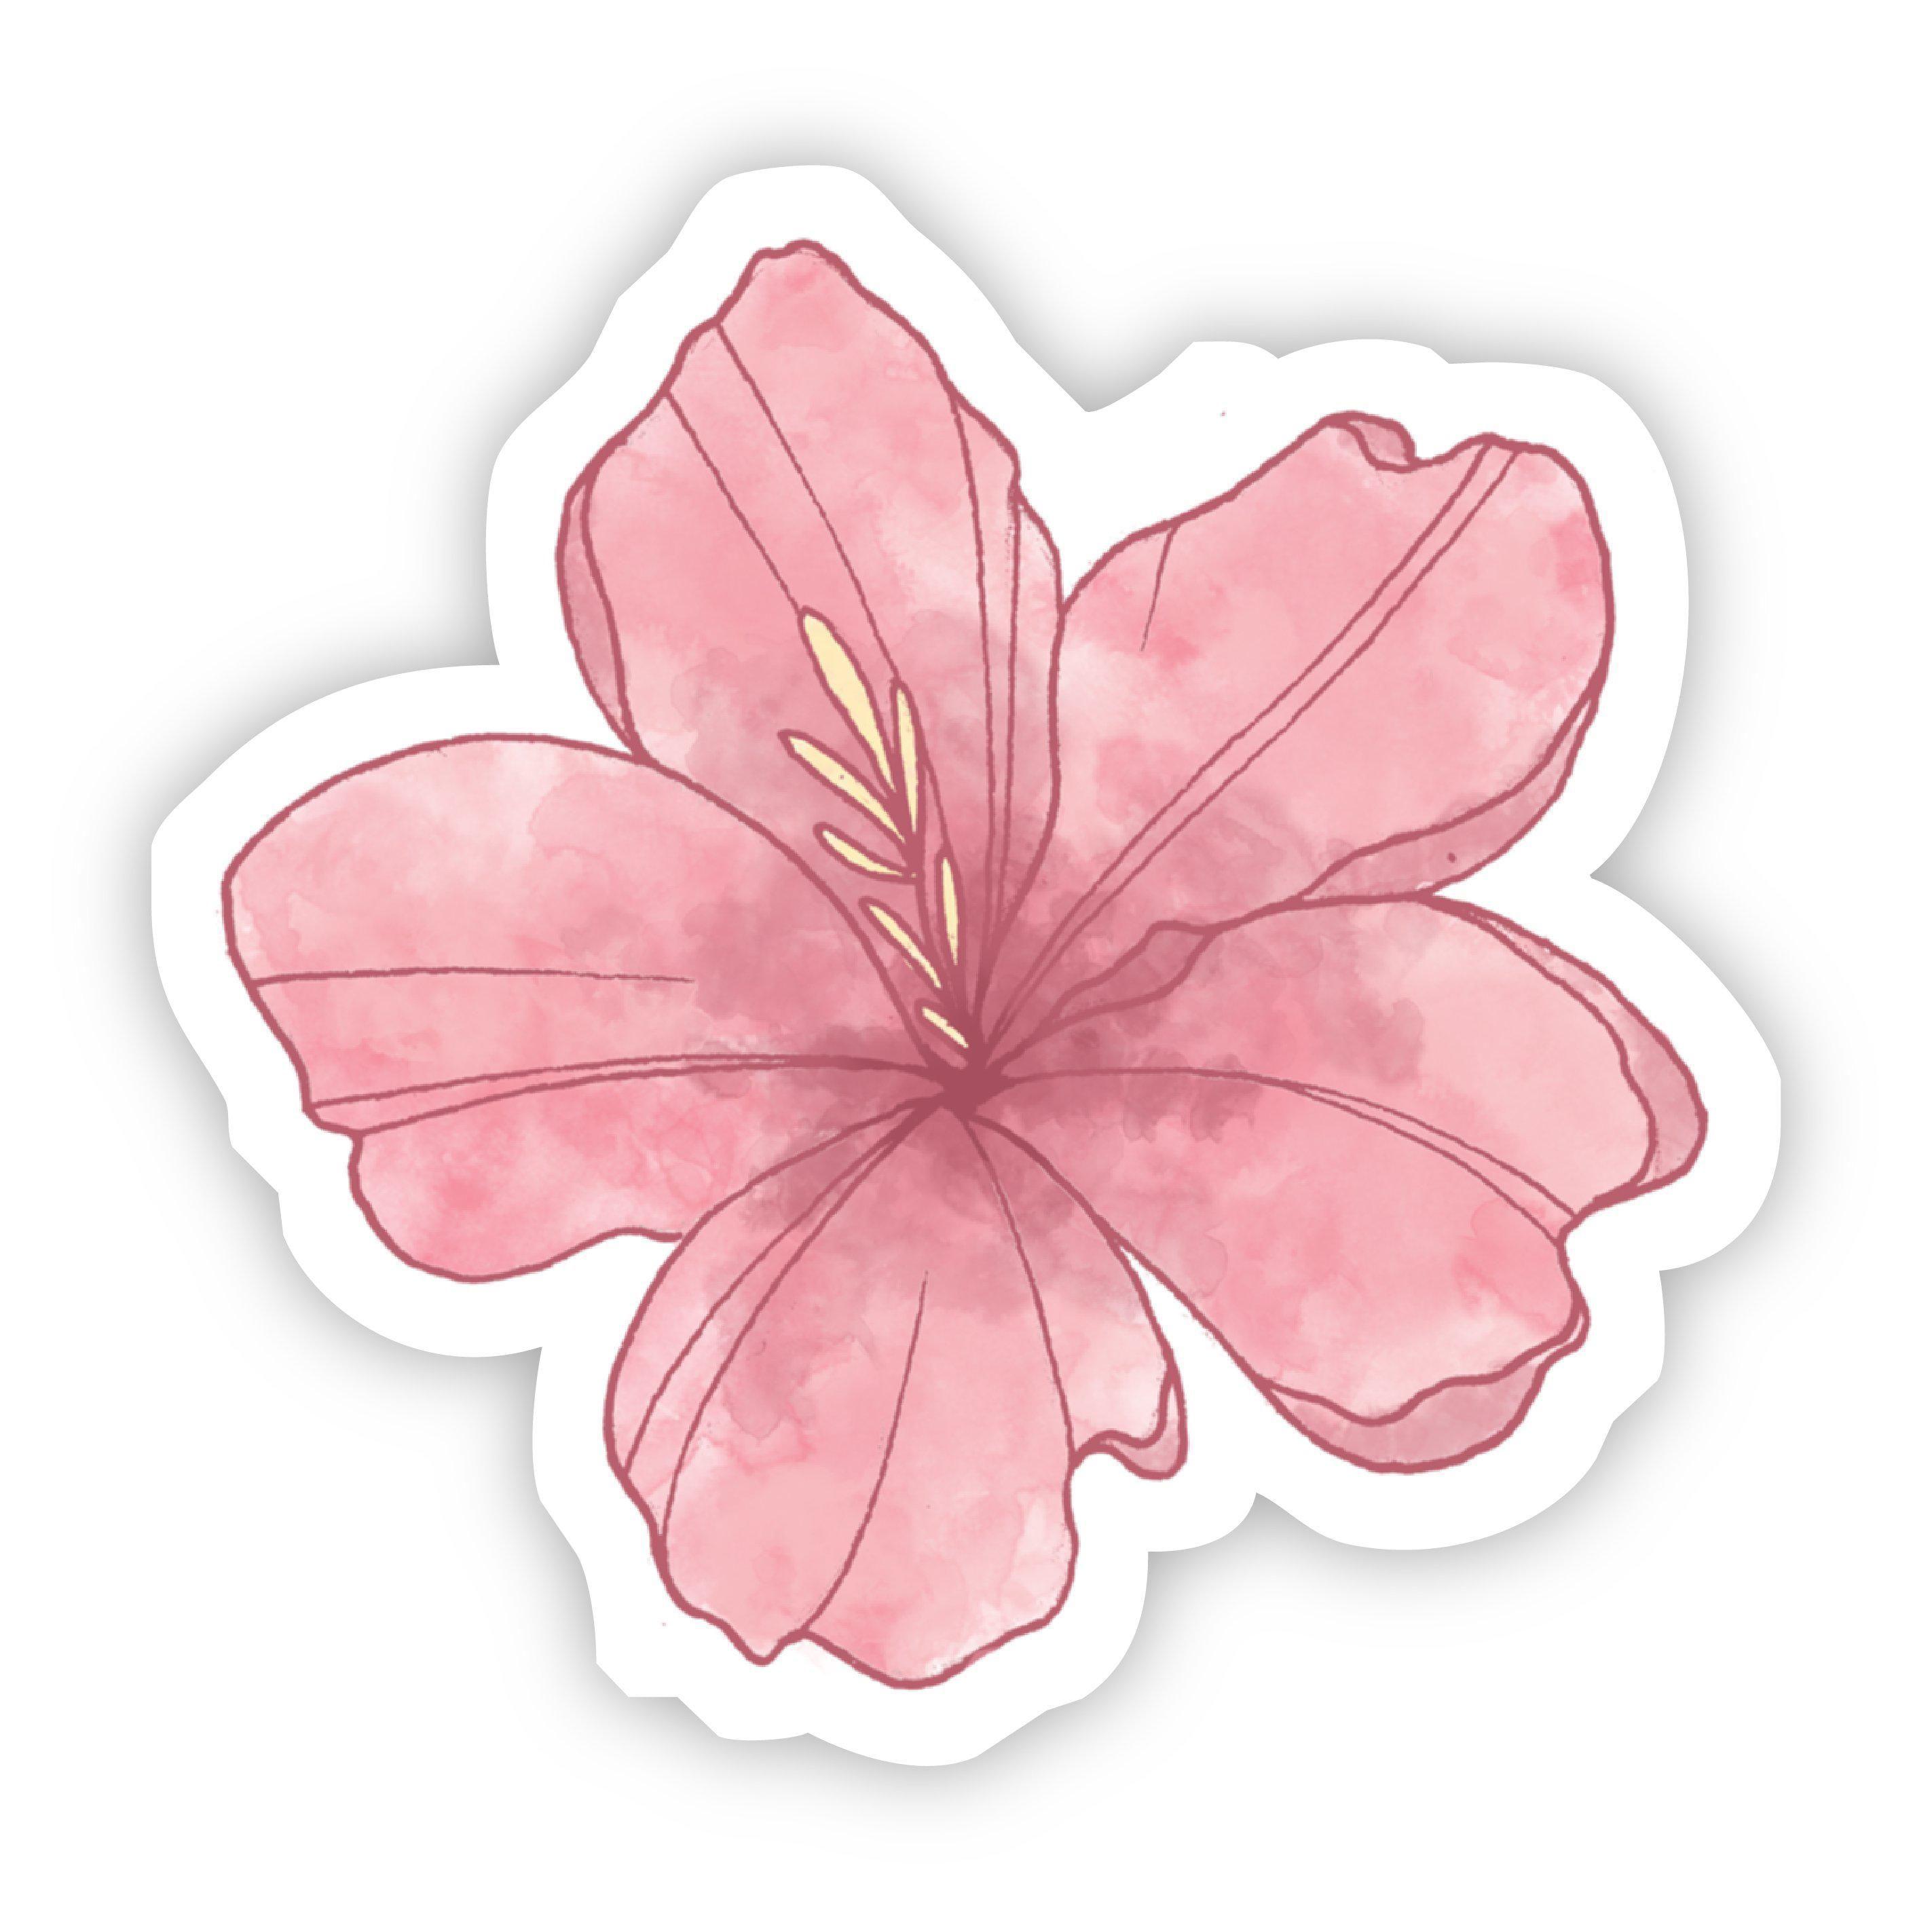 Pink Flower Watercolor Sticker | Waterproof Vinyl Sticker | 3 x 2.95 inches | Big Moods